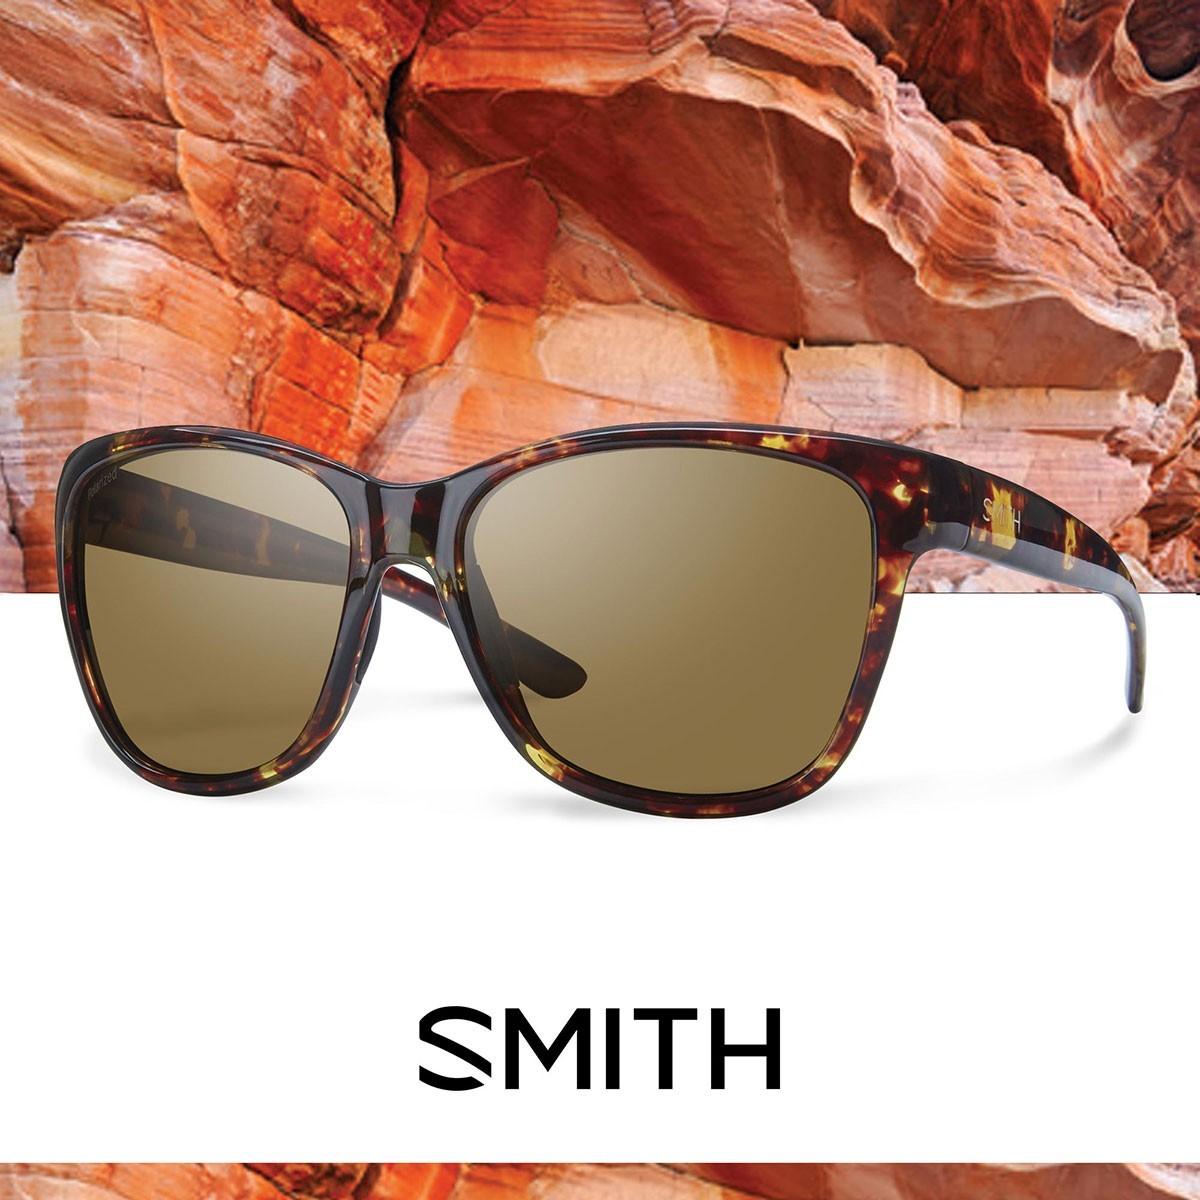 SMITH RAMONA tortoise - Изображение - AQUAMATRIX